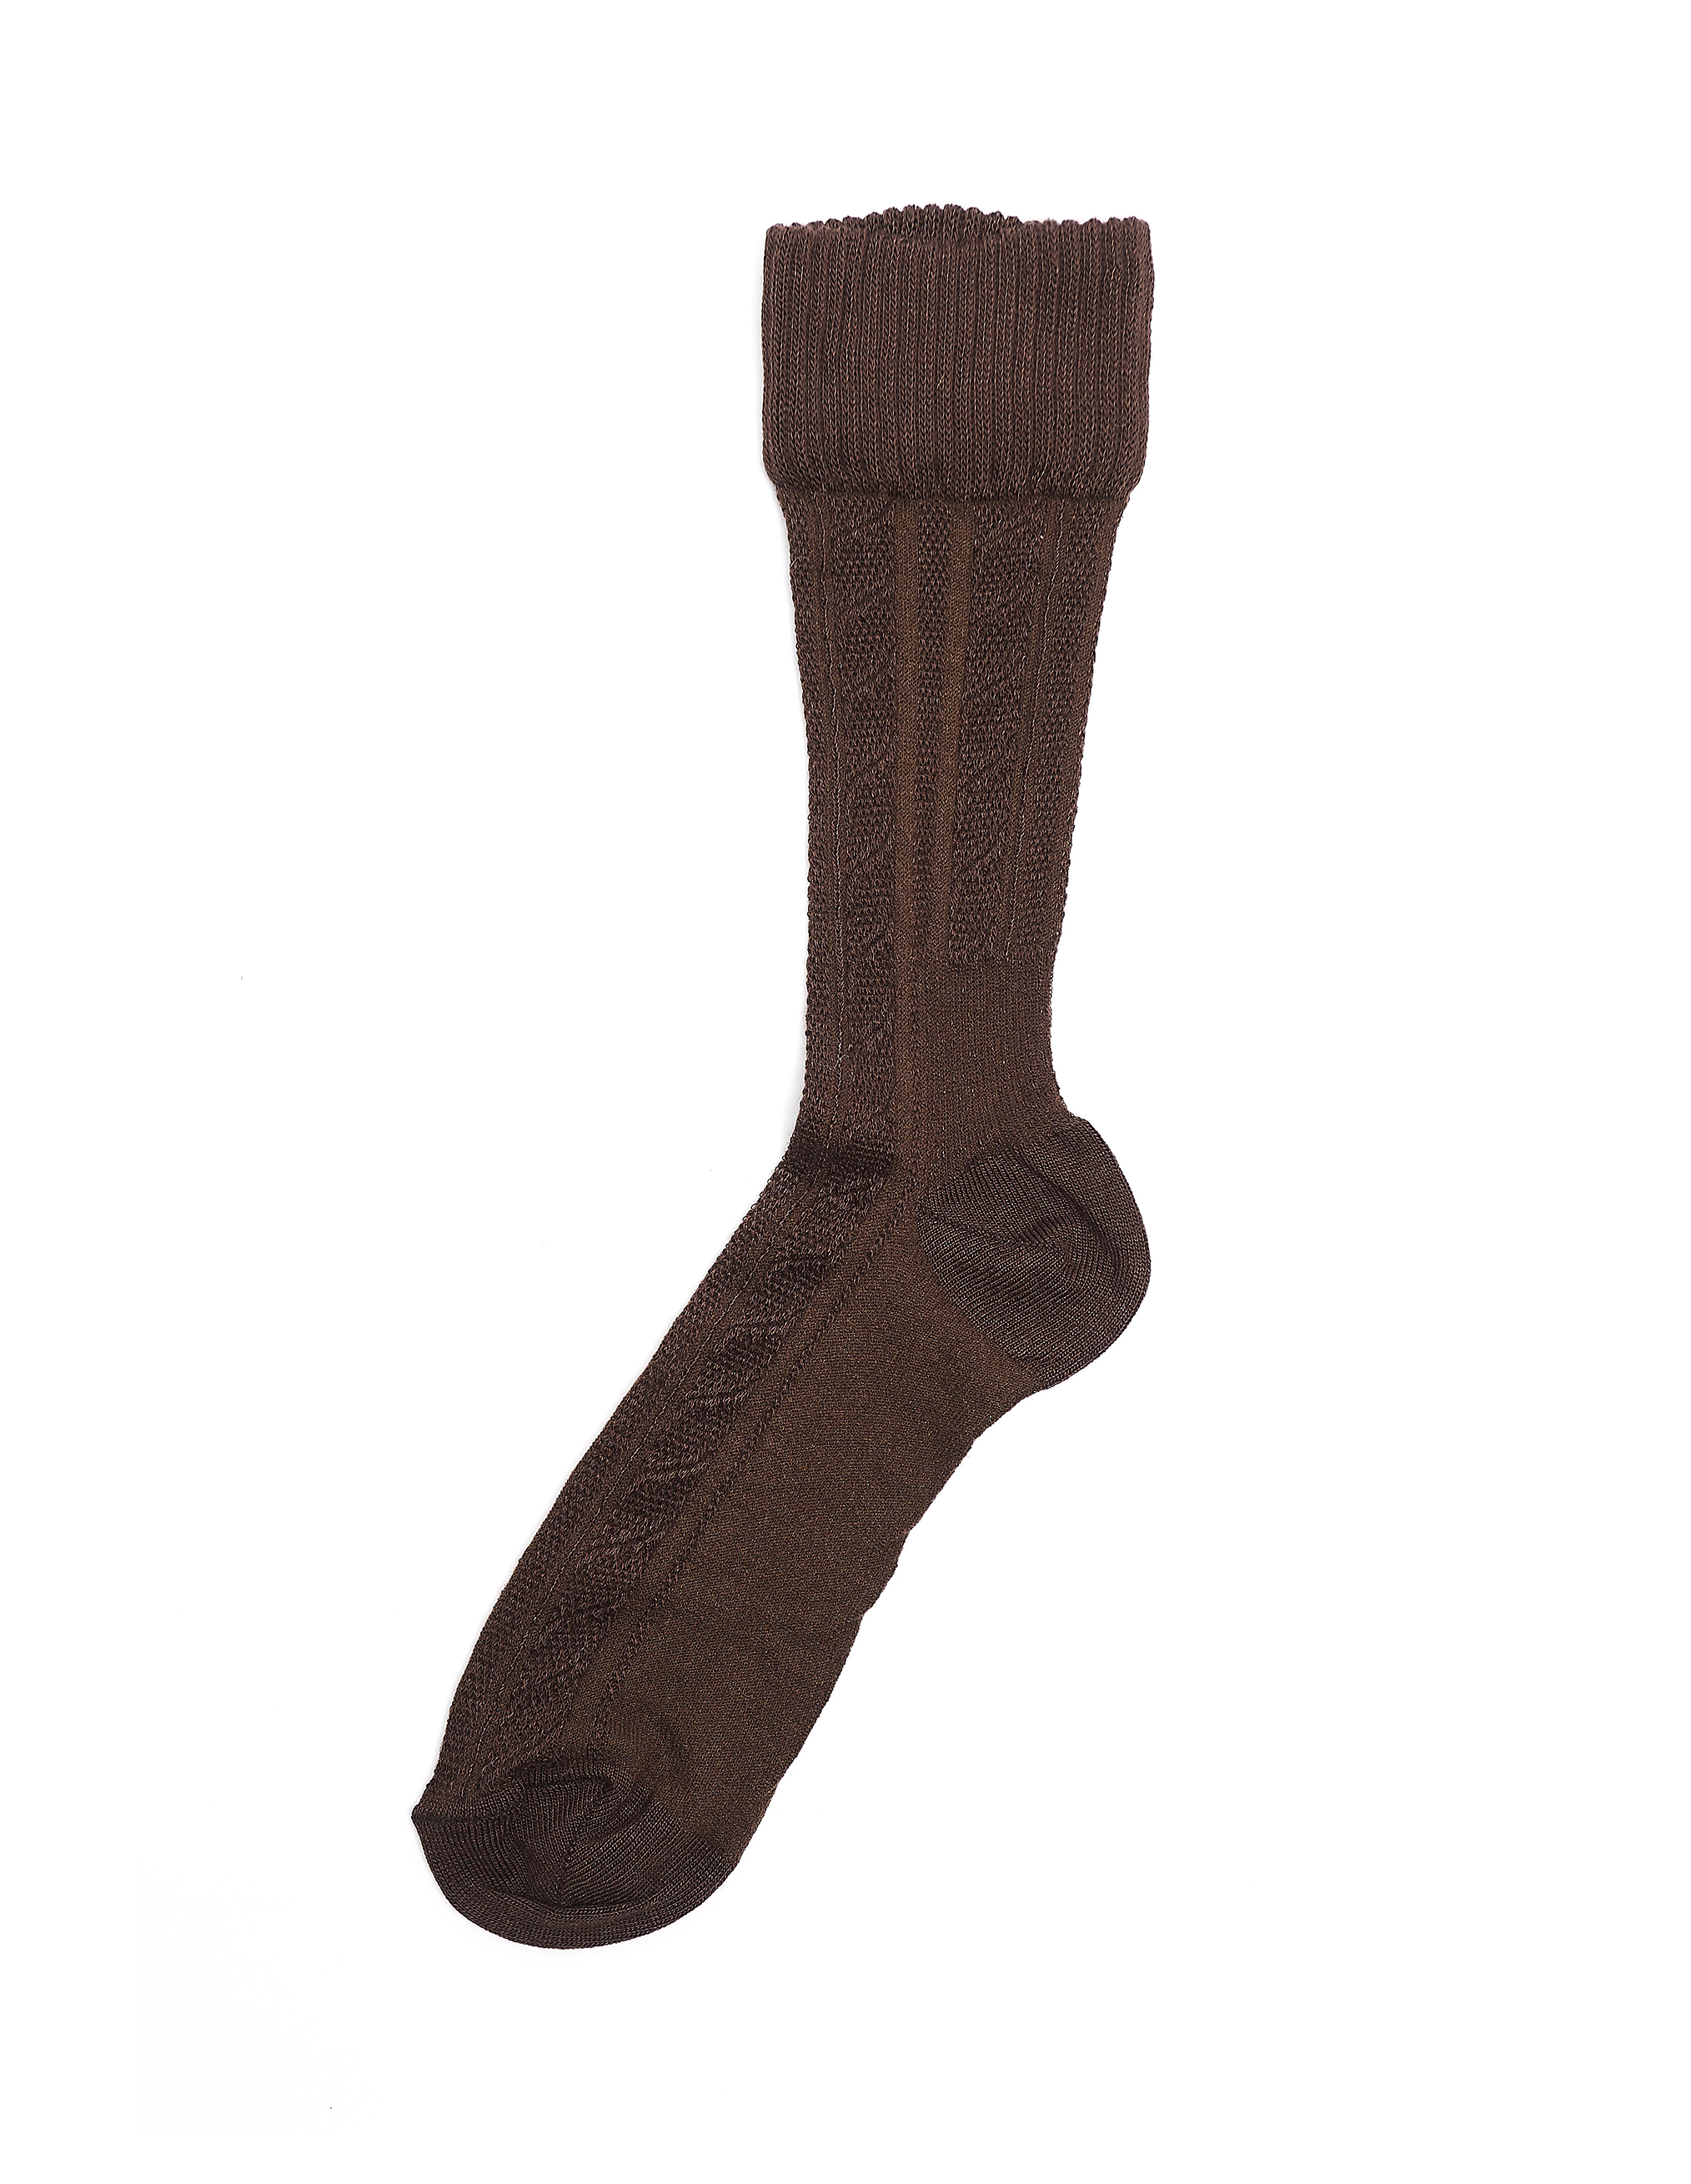 Golden Goose Brown Socks